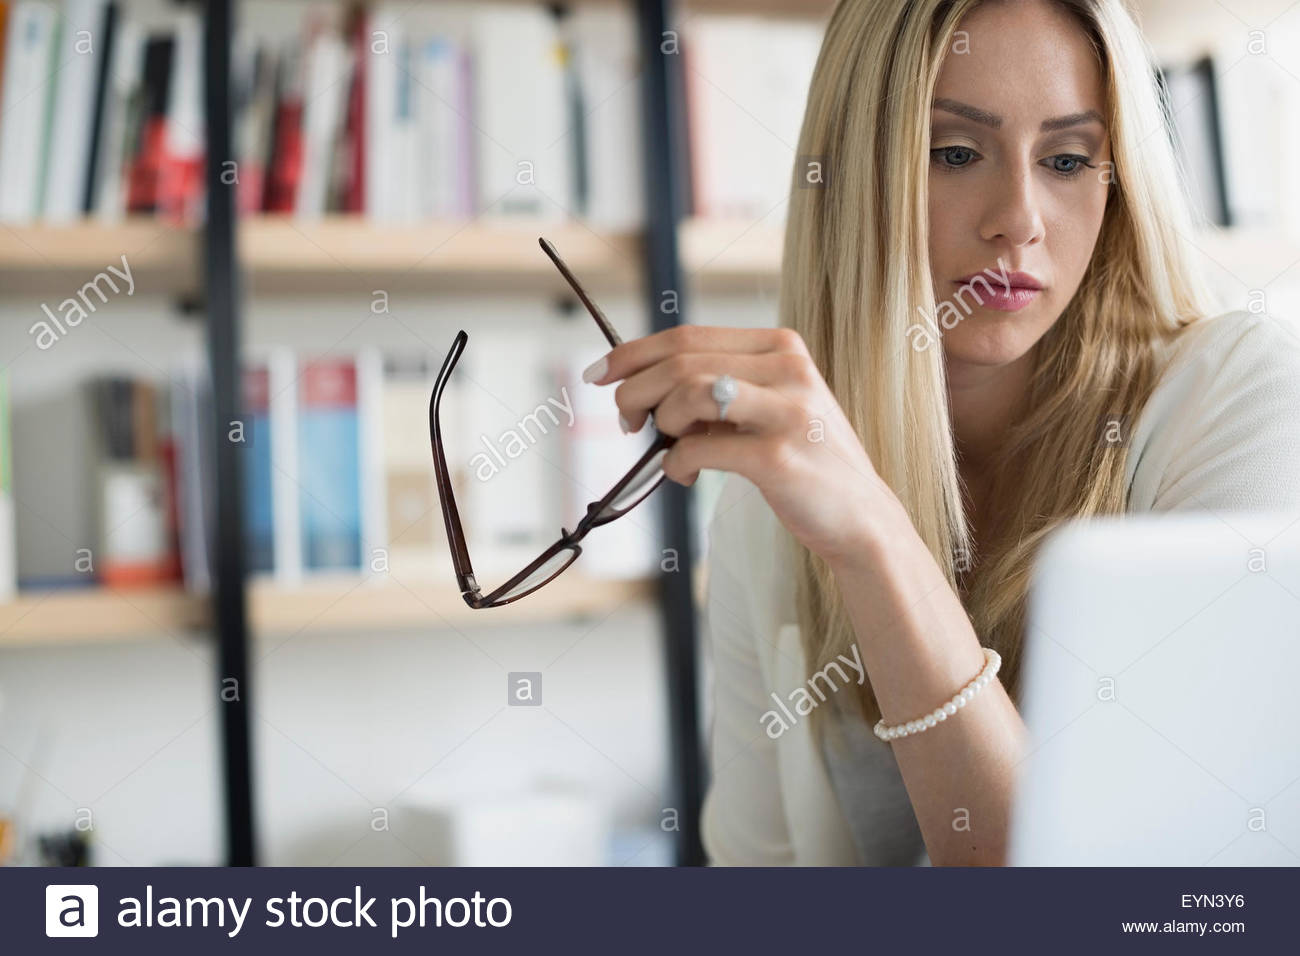 Serious businesswoman holding eyeglasses using laptop - Stock Image